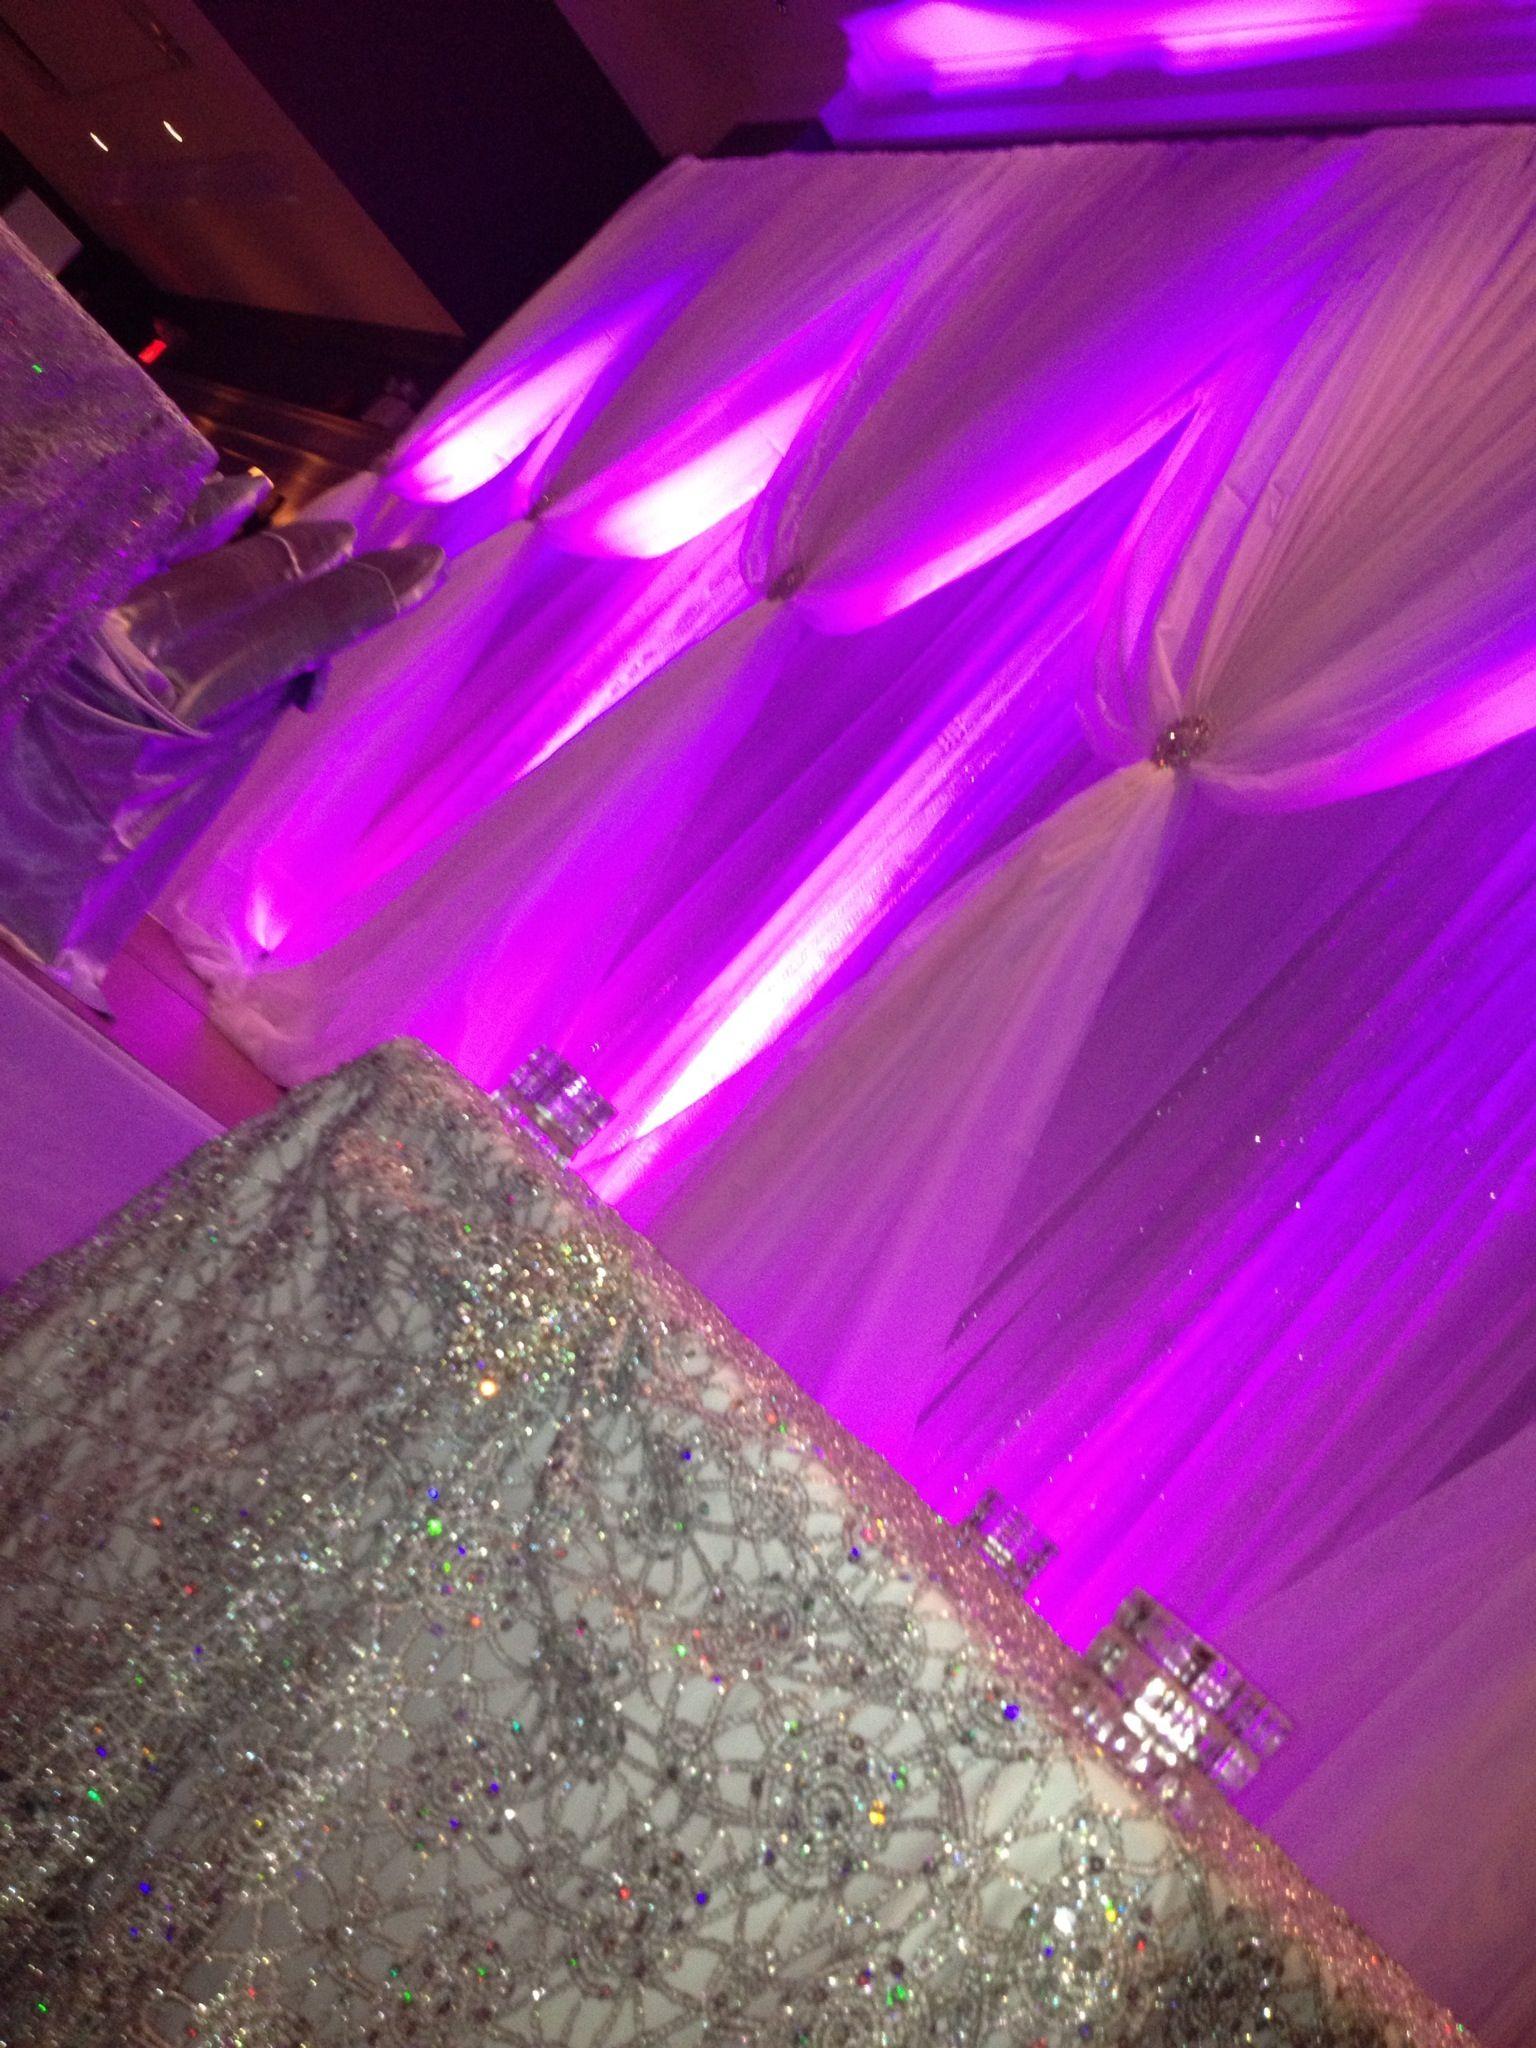 Wedding decorations backdrop  Purple wedding backdrop  wedding backdrops  Pinterest  Purple